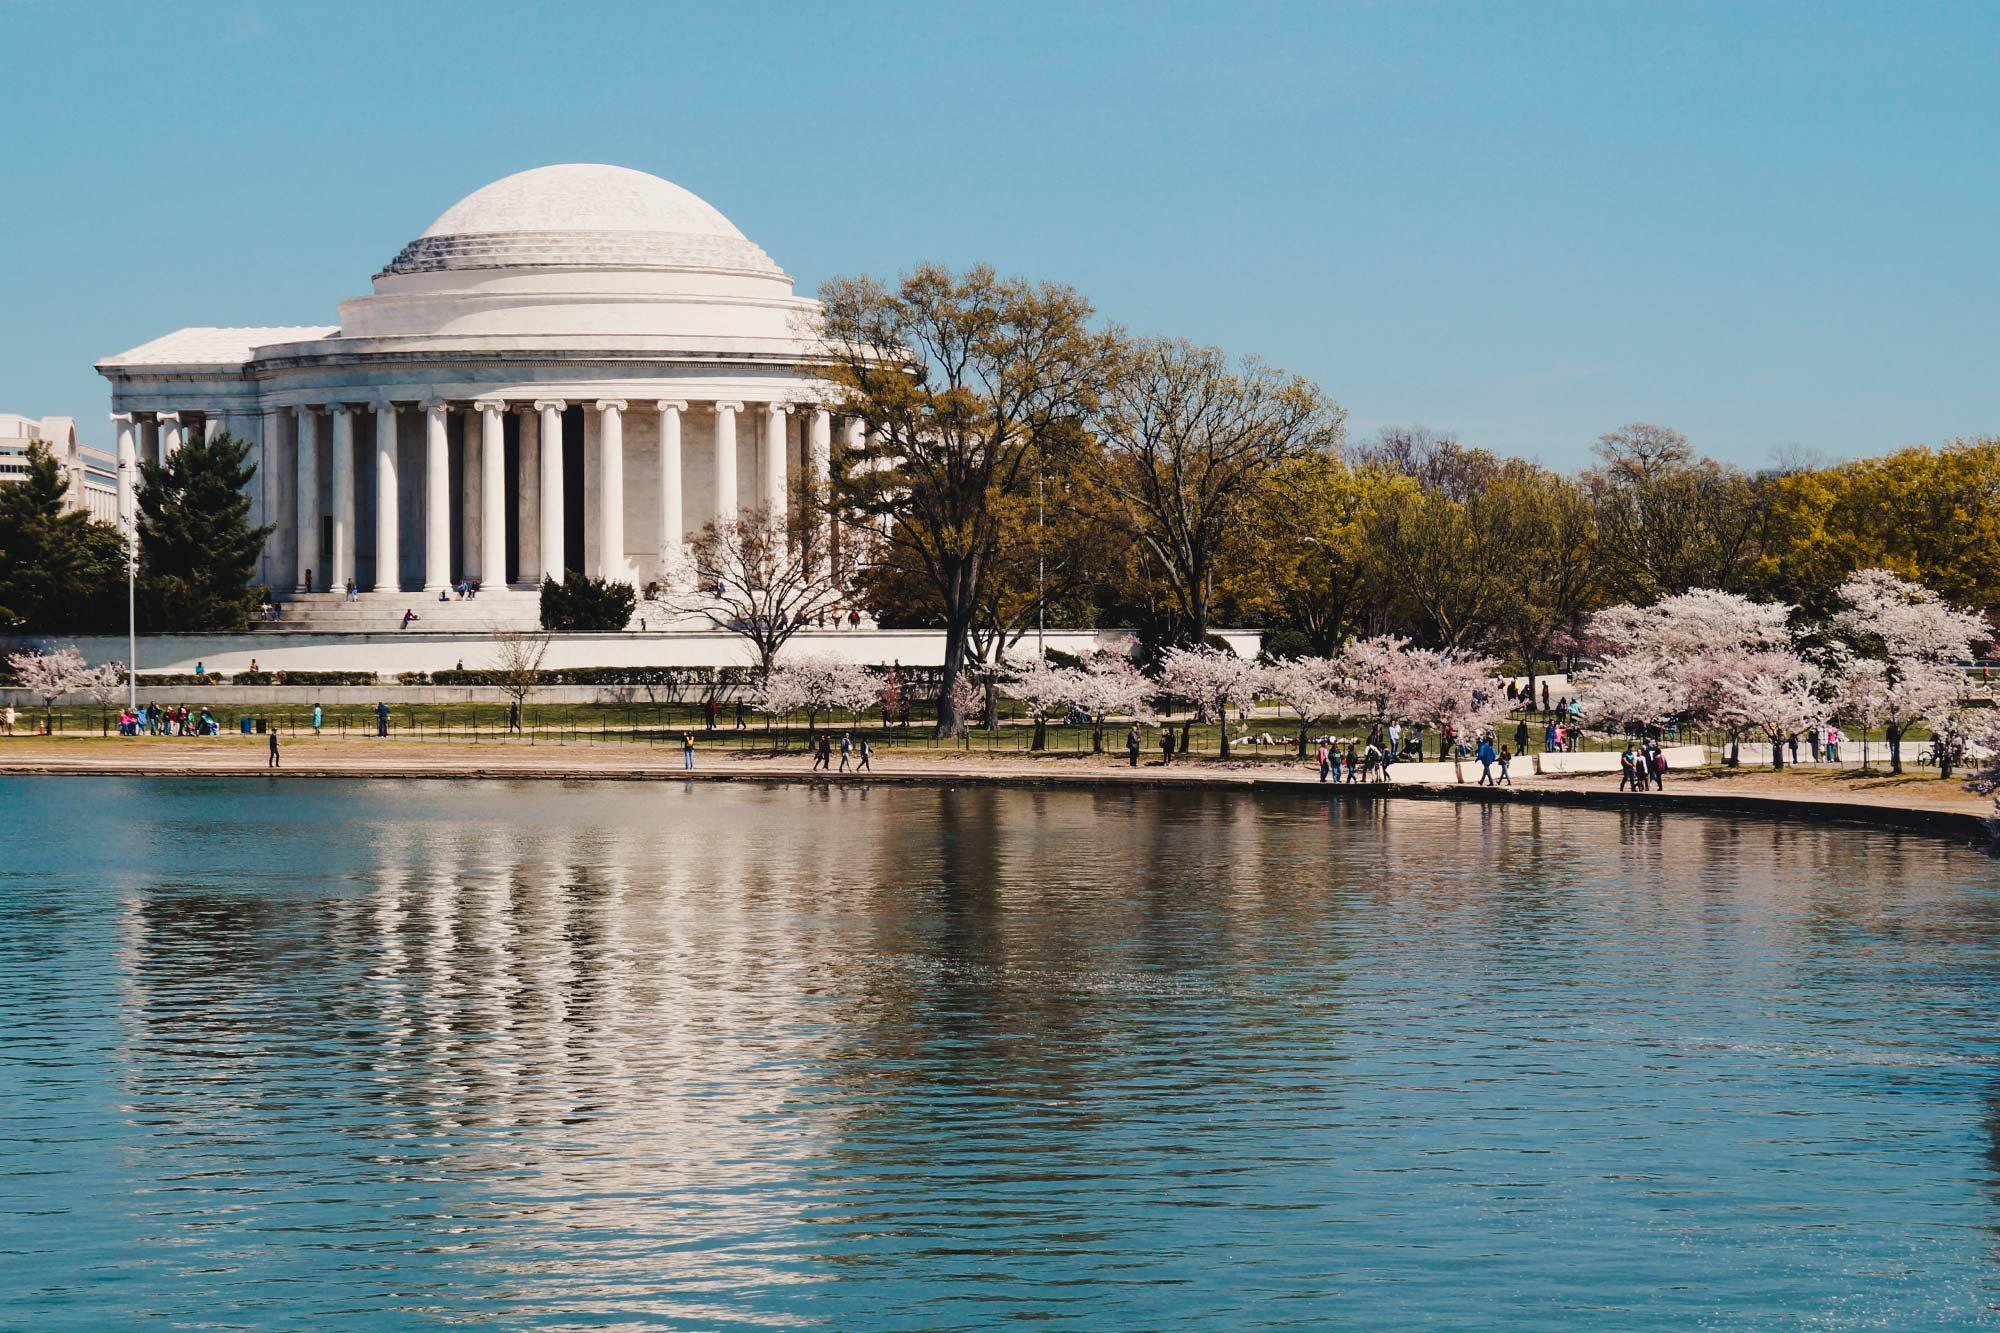 Een 4-daagse stedentrip naar Washington D.C.